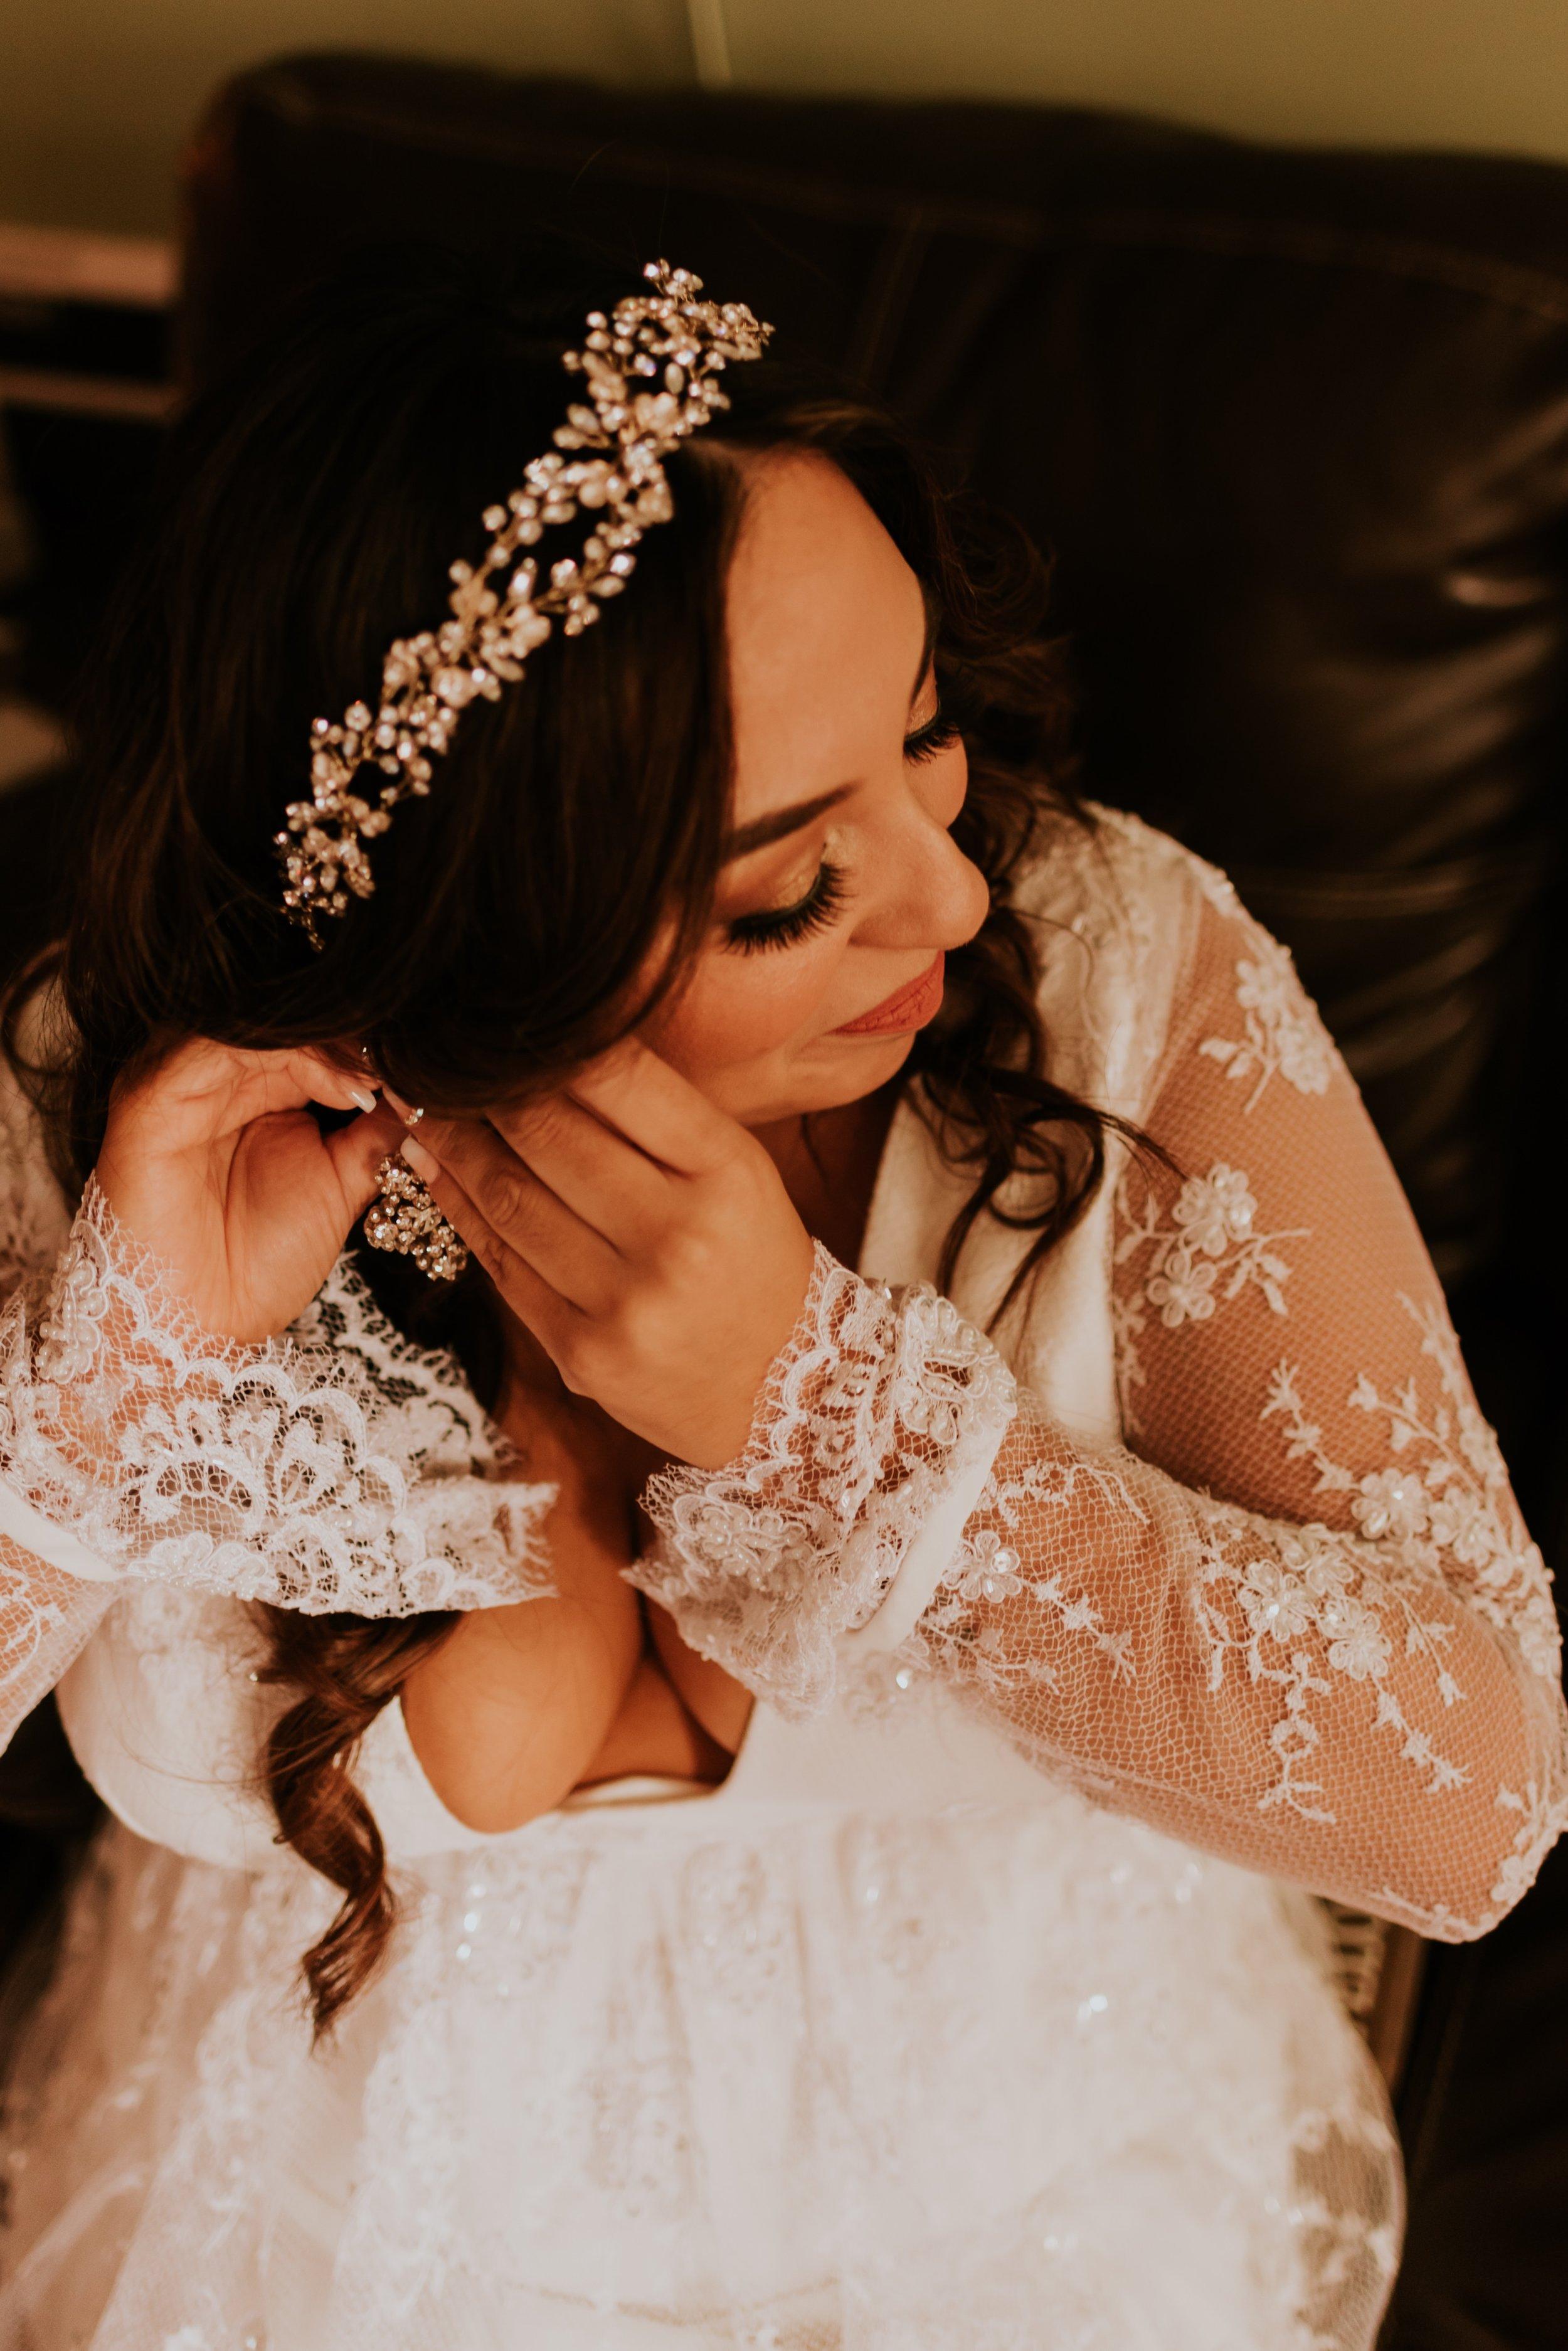 Ellwood Bluffs Santa Barbara Elopement   Carrie Rogers Photography   Getting Ready Details   Santa Barbara Wedding Photographer   California Elopement Photographer   #weddingphotography #elopement